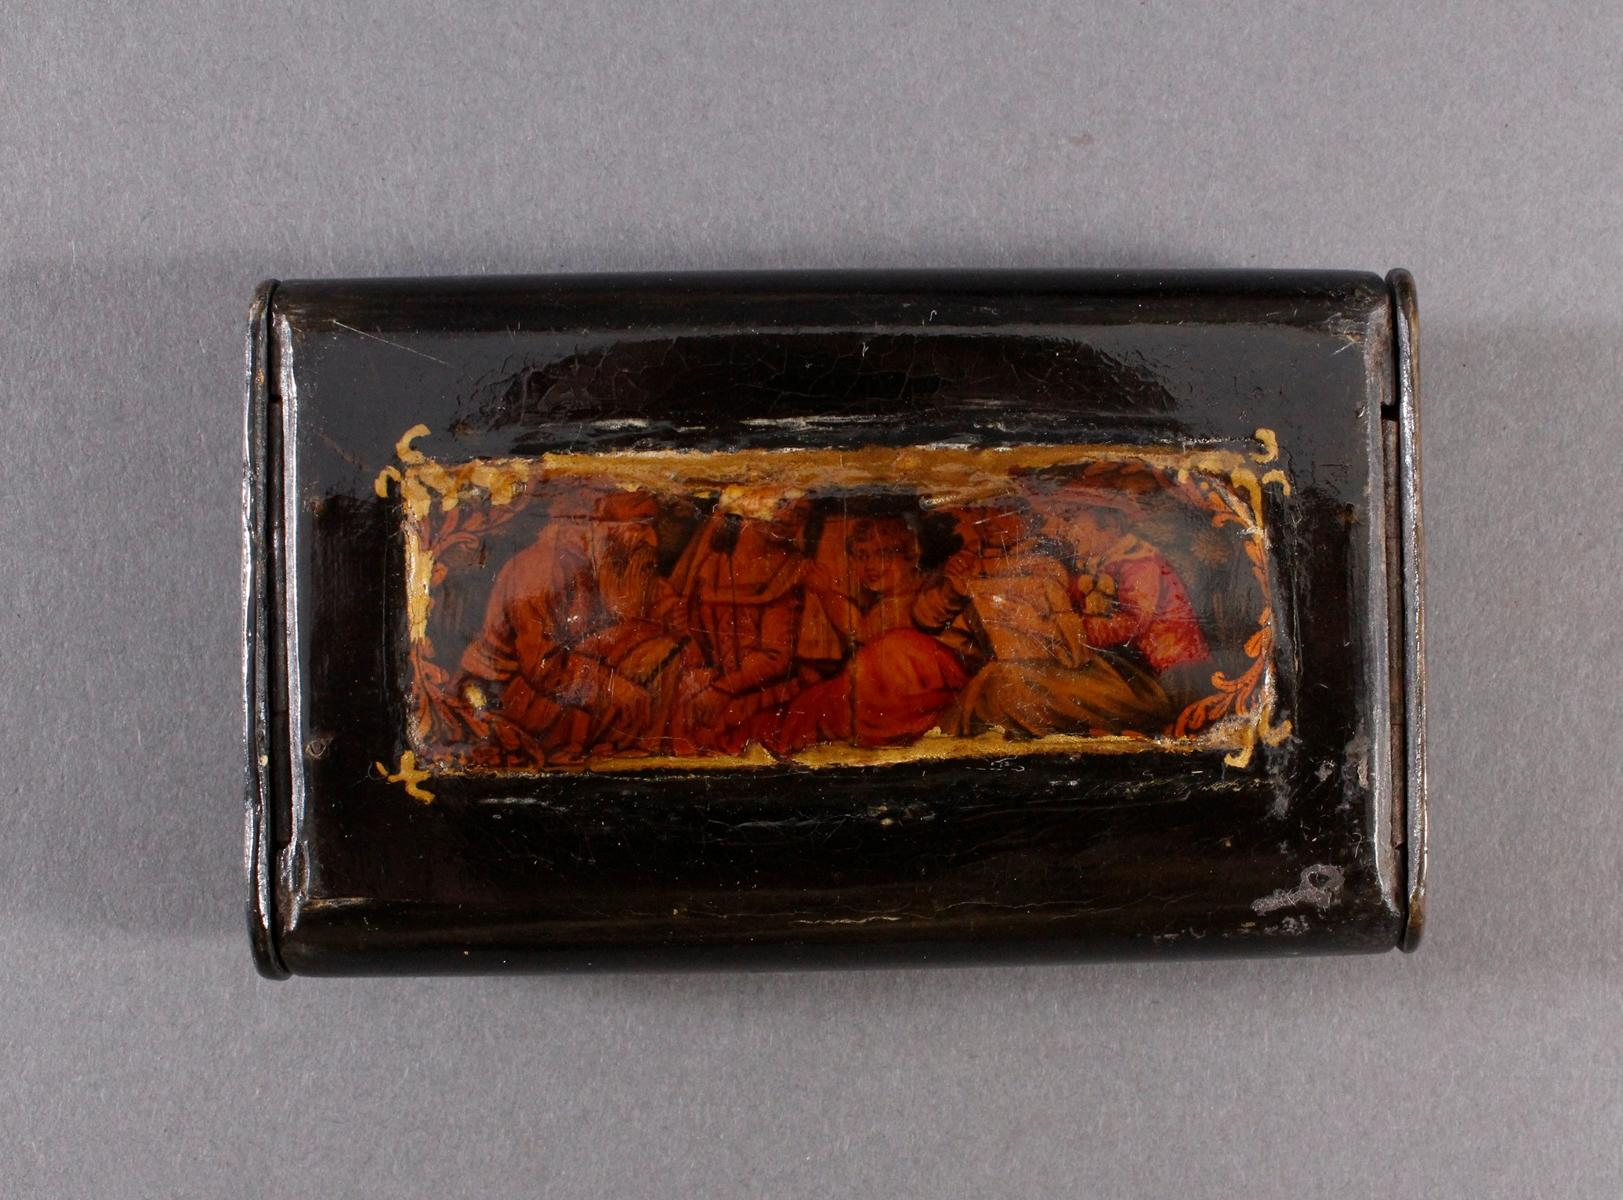 Zigarettenetui, Art Stobwasser 19. Jh.-2